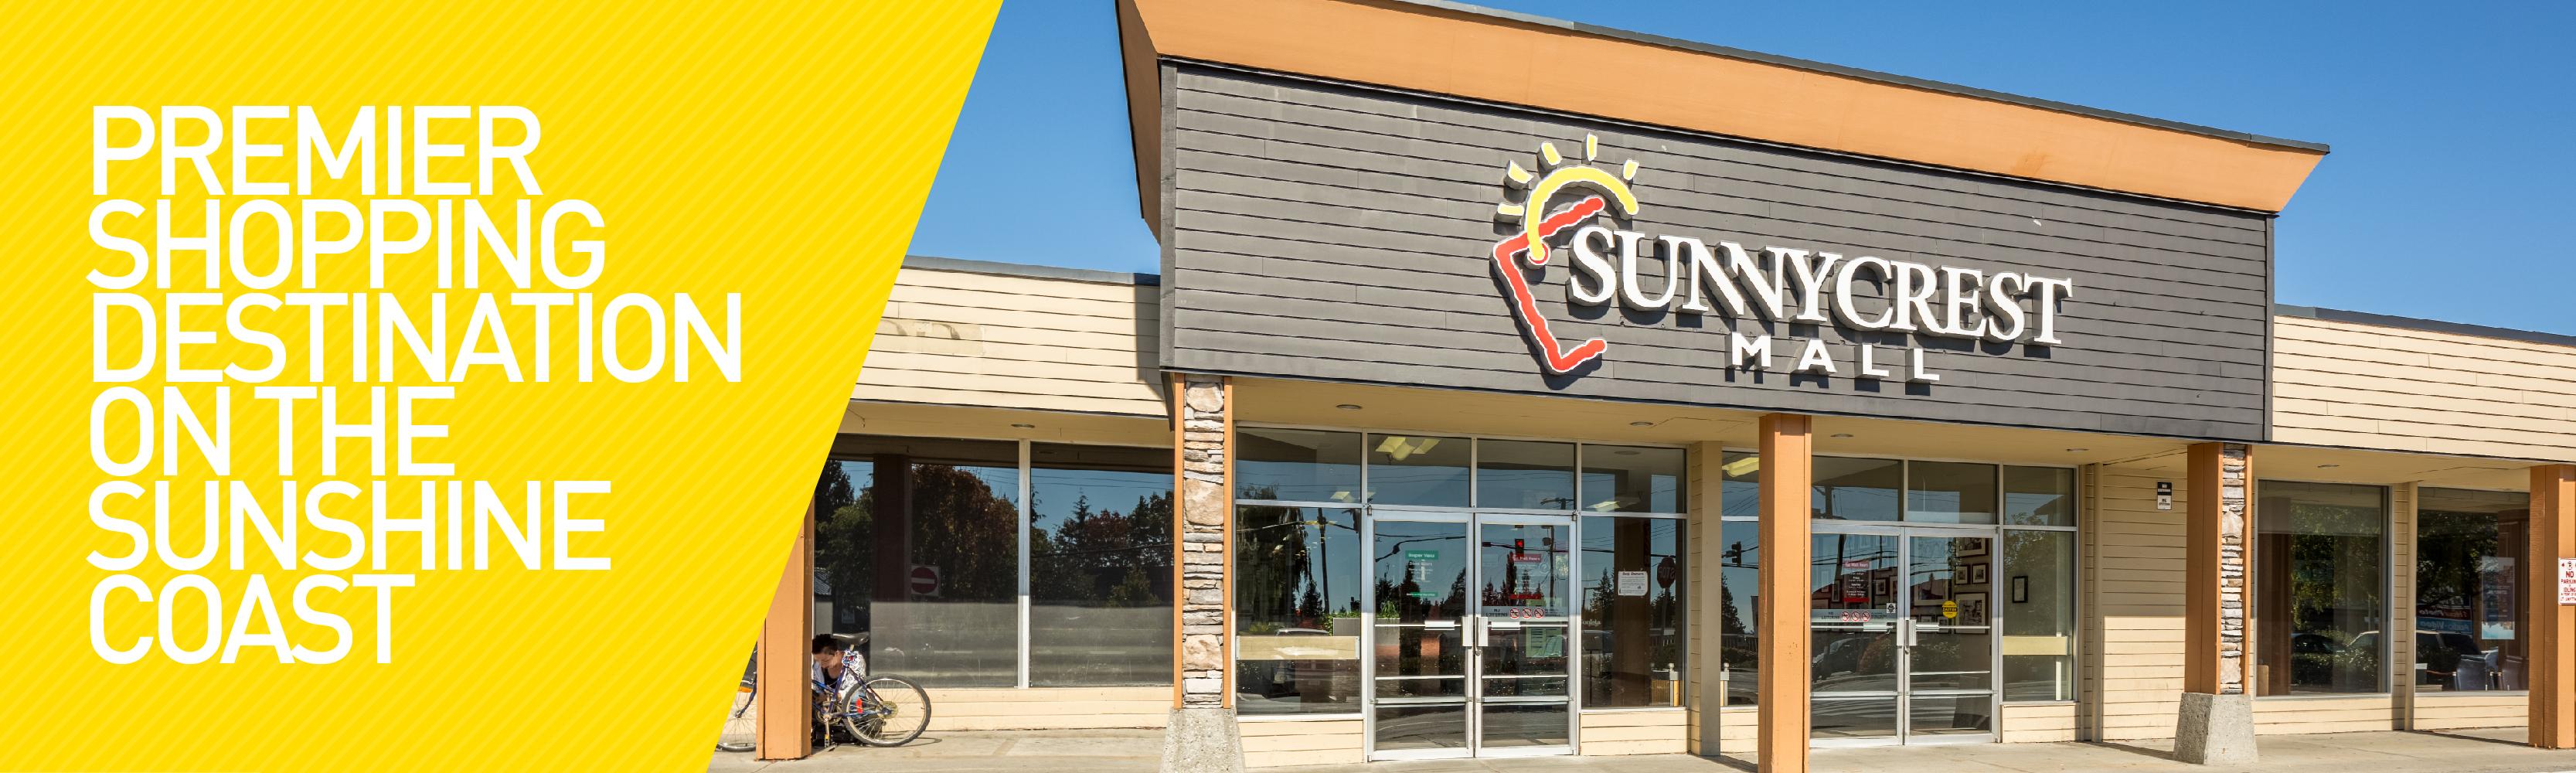 Sunnycrest Mall